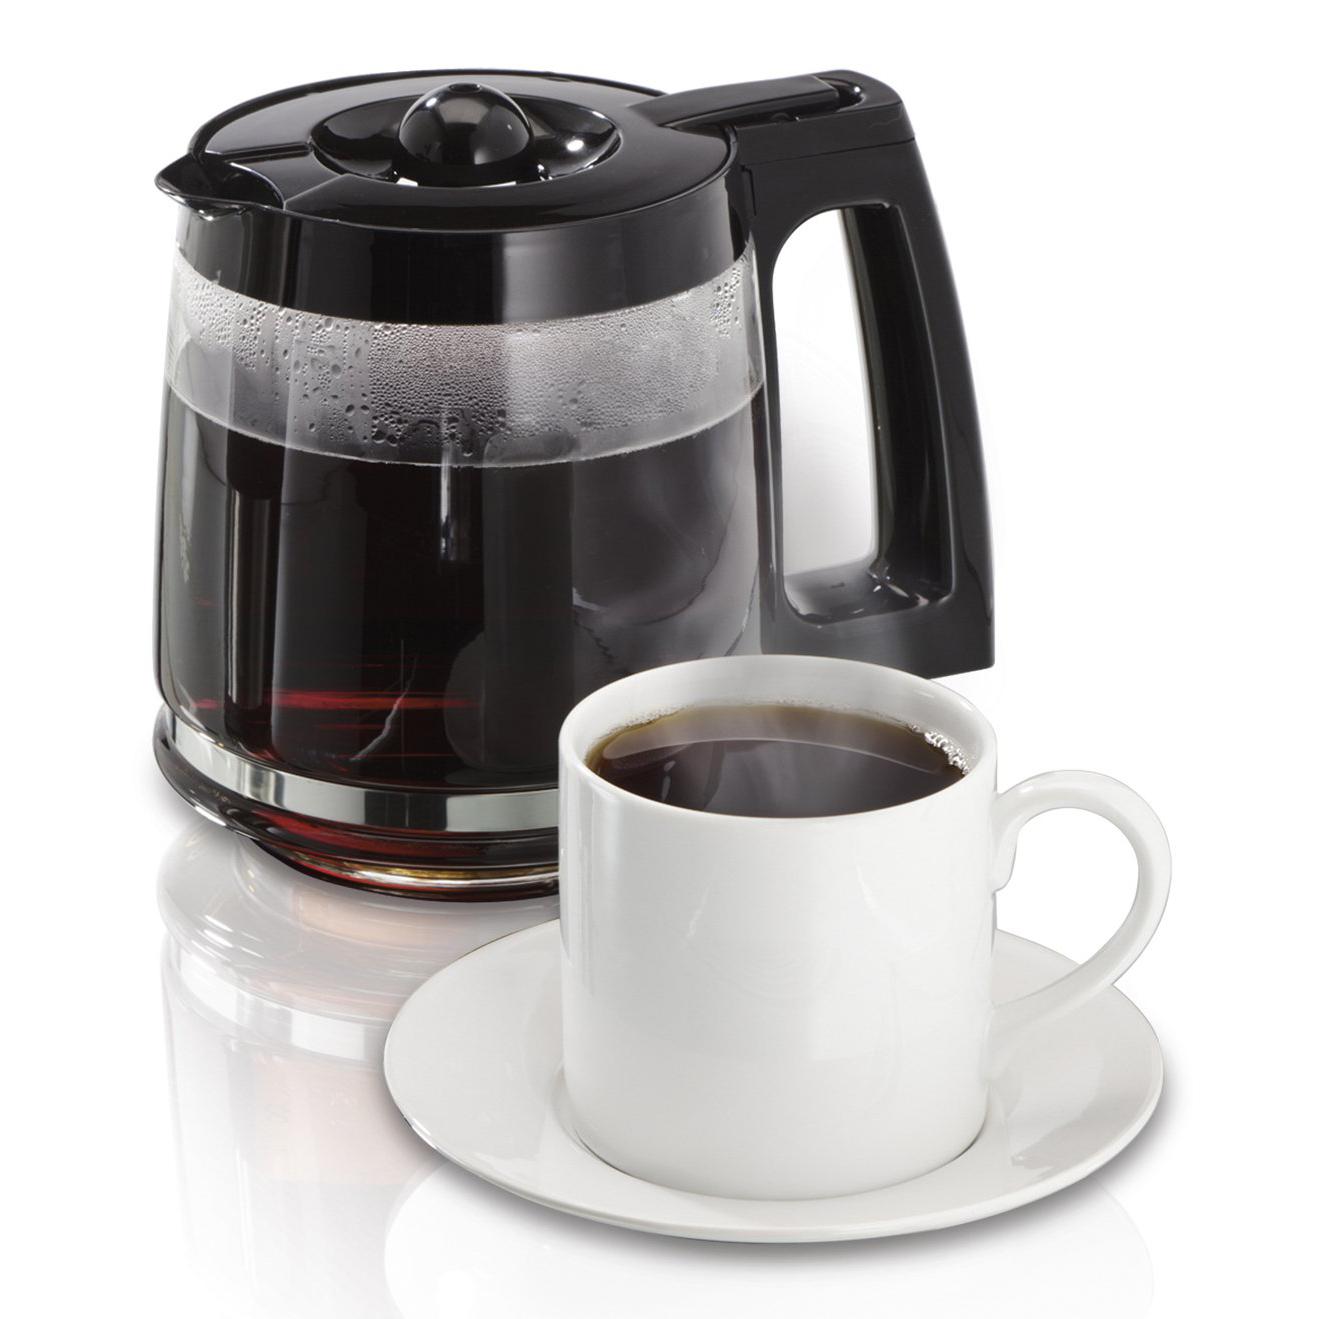 Hamilton Beach 2-Way FlexBrew 1-12 Cup K-Cup Ready Coffee ...